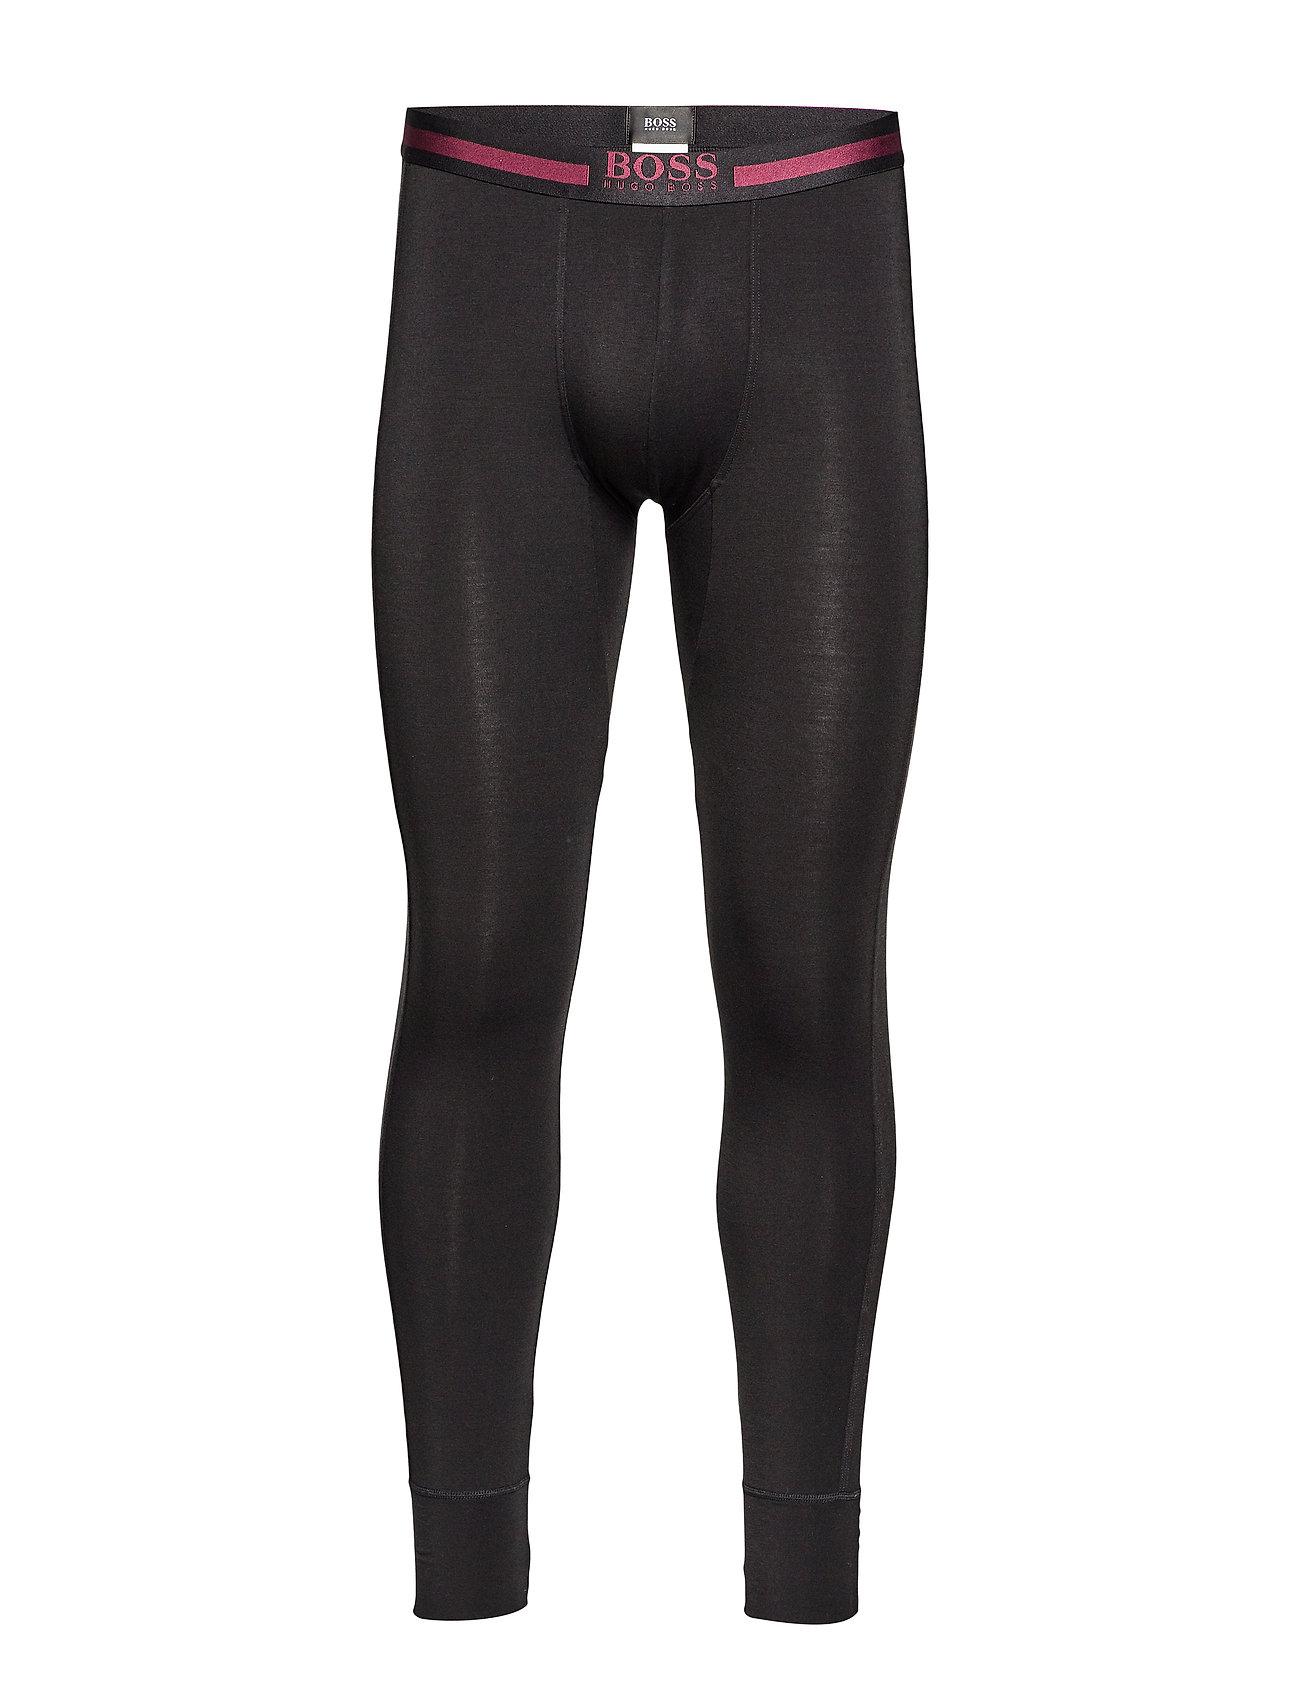 BOSS Business Wear Long John Thermal+ - BLACK